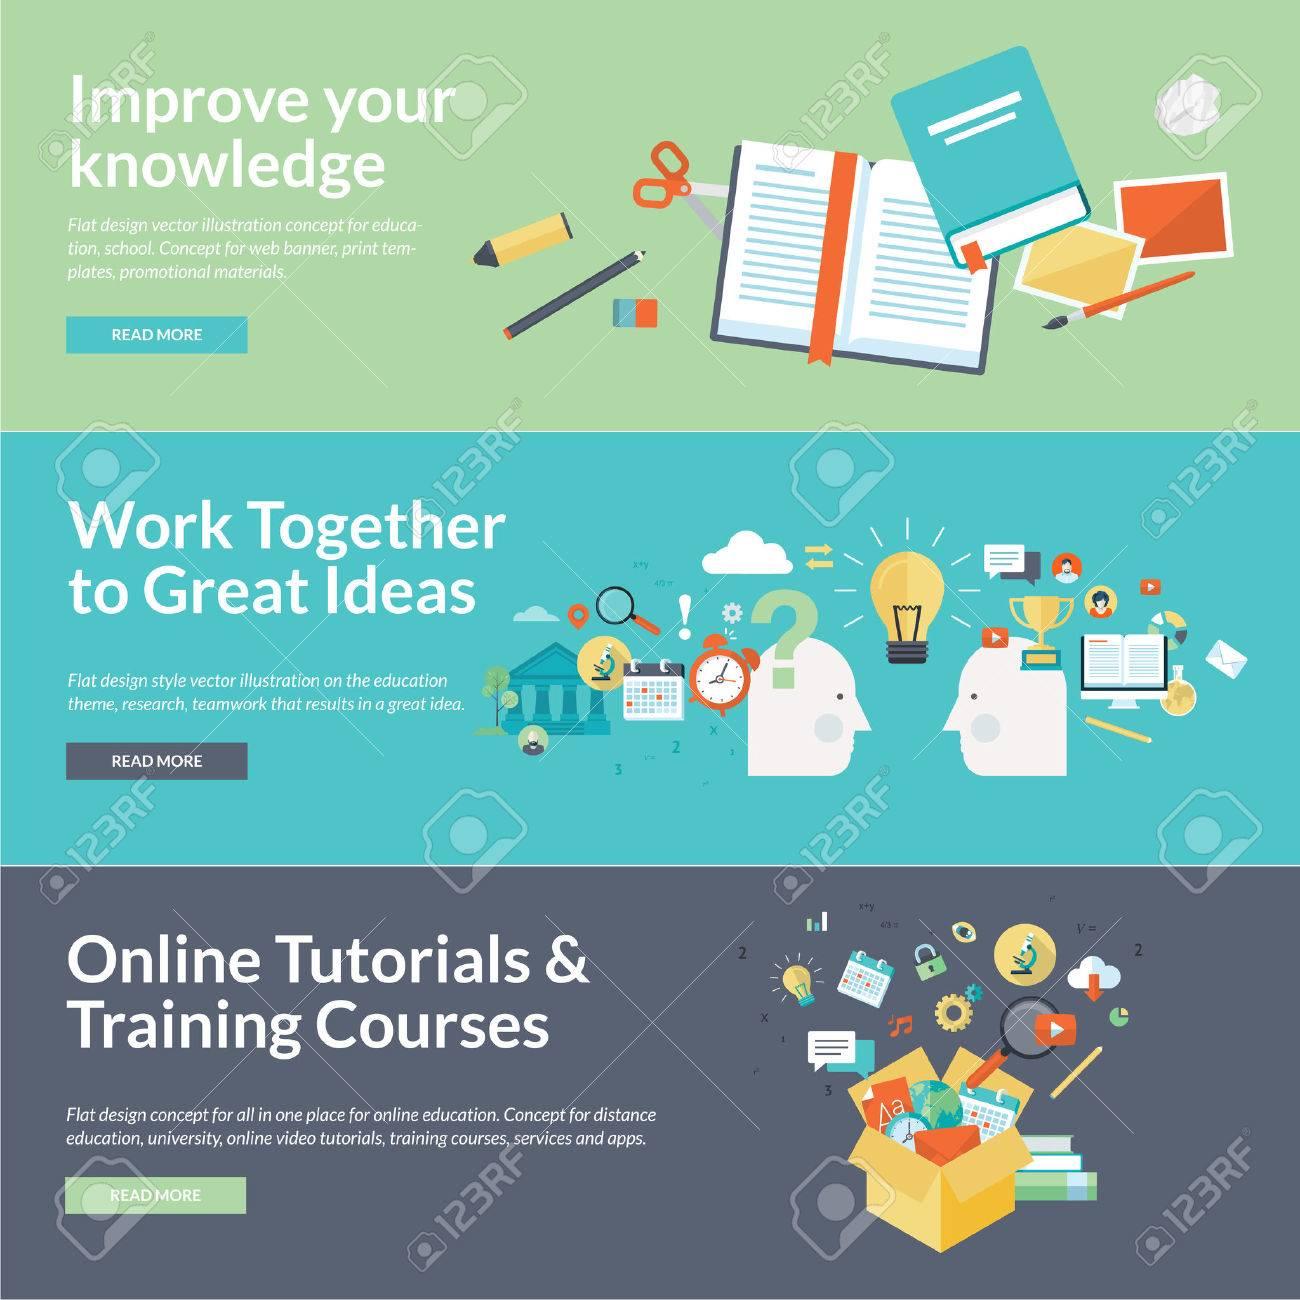 Flat design illustration concepts for education - 32571396